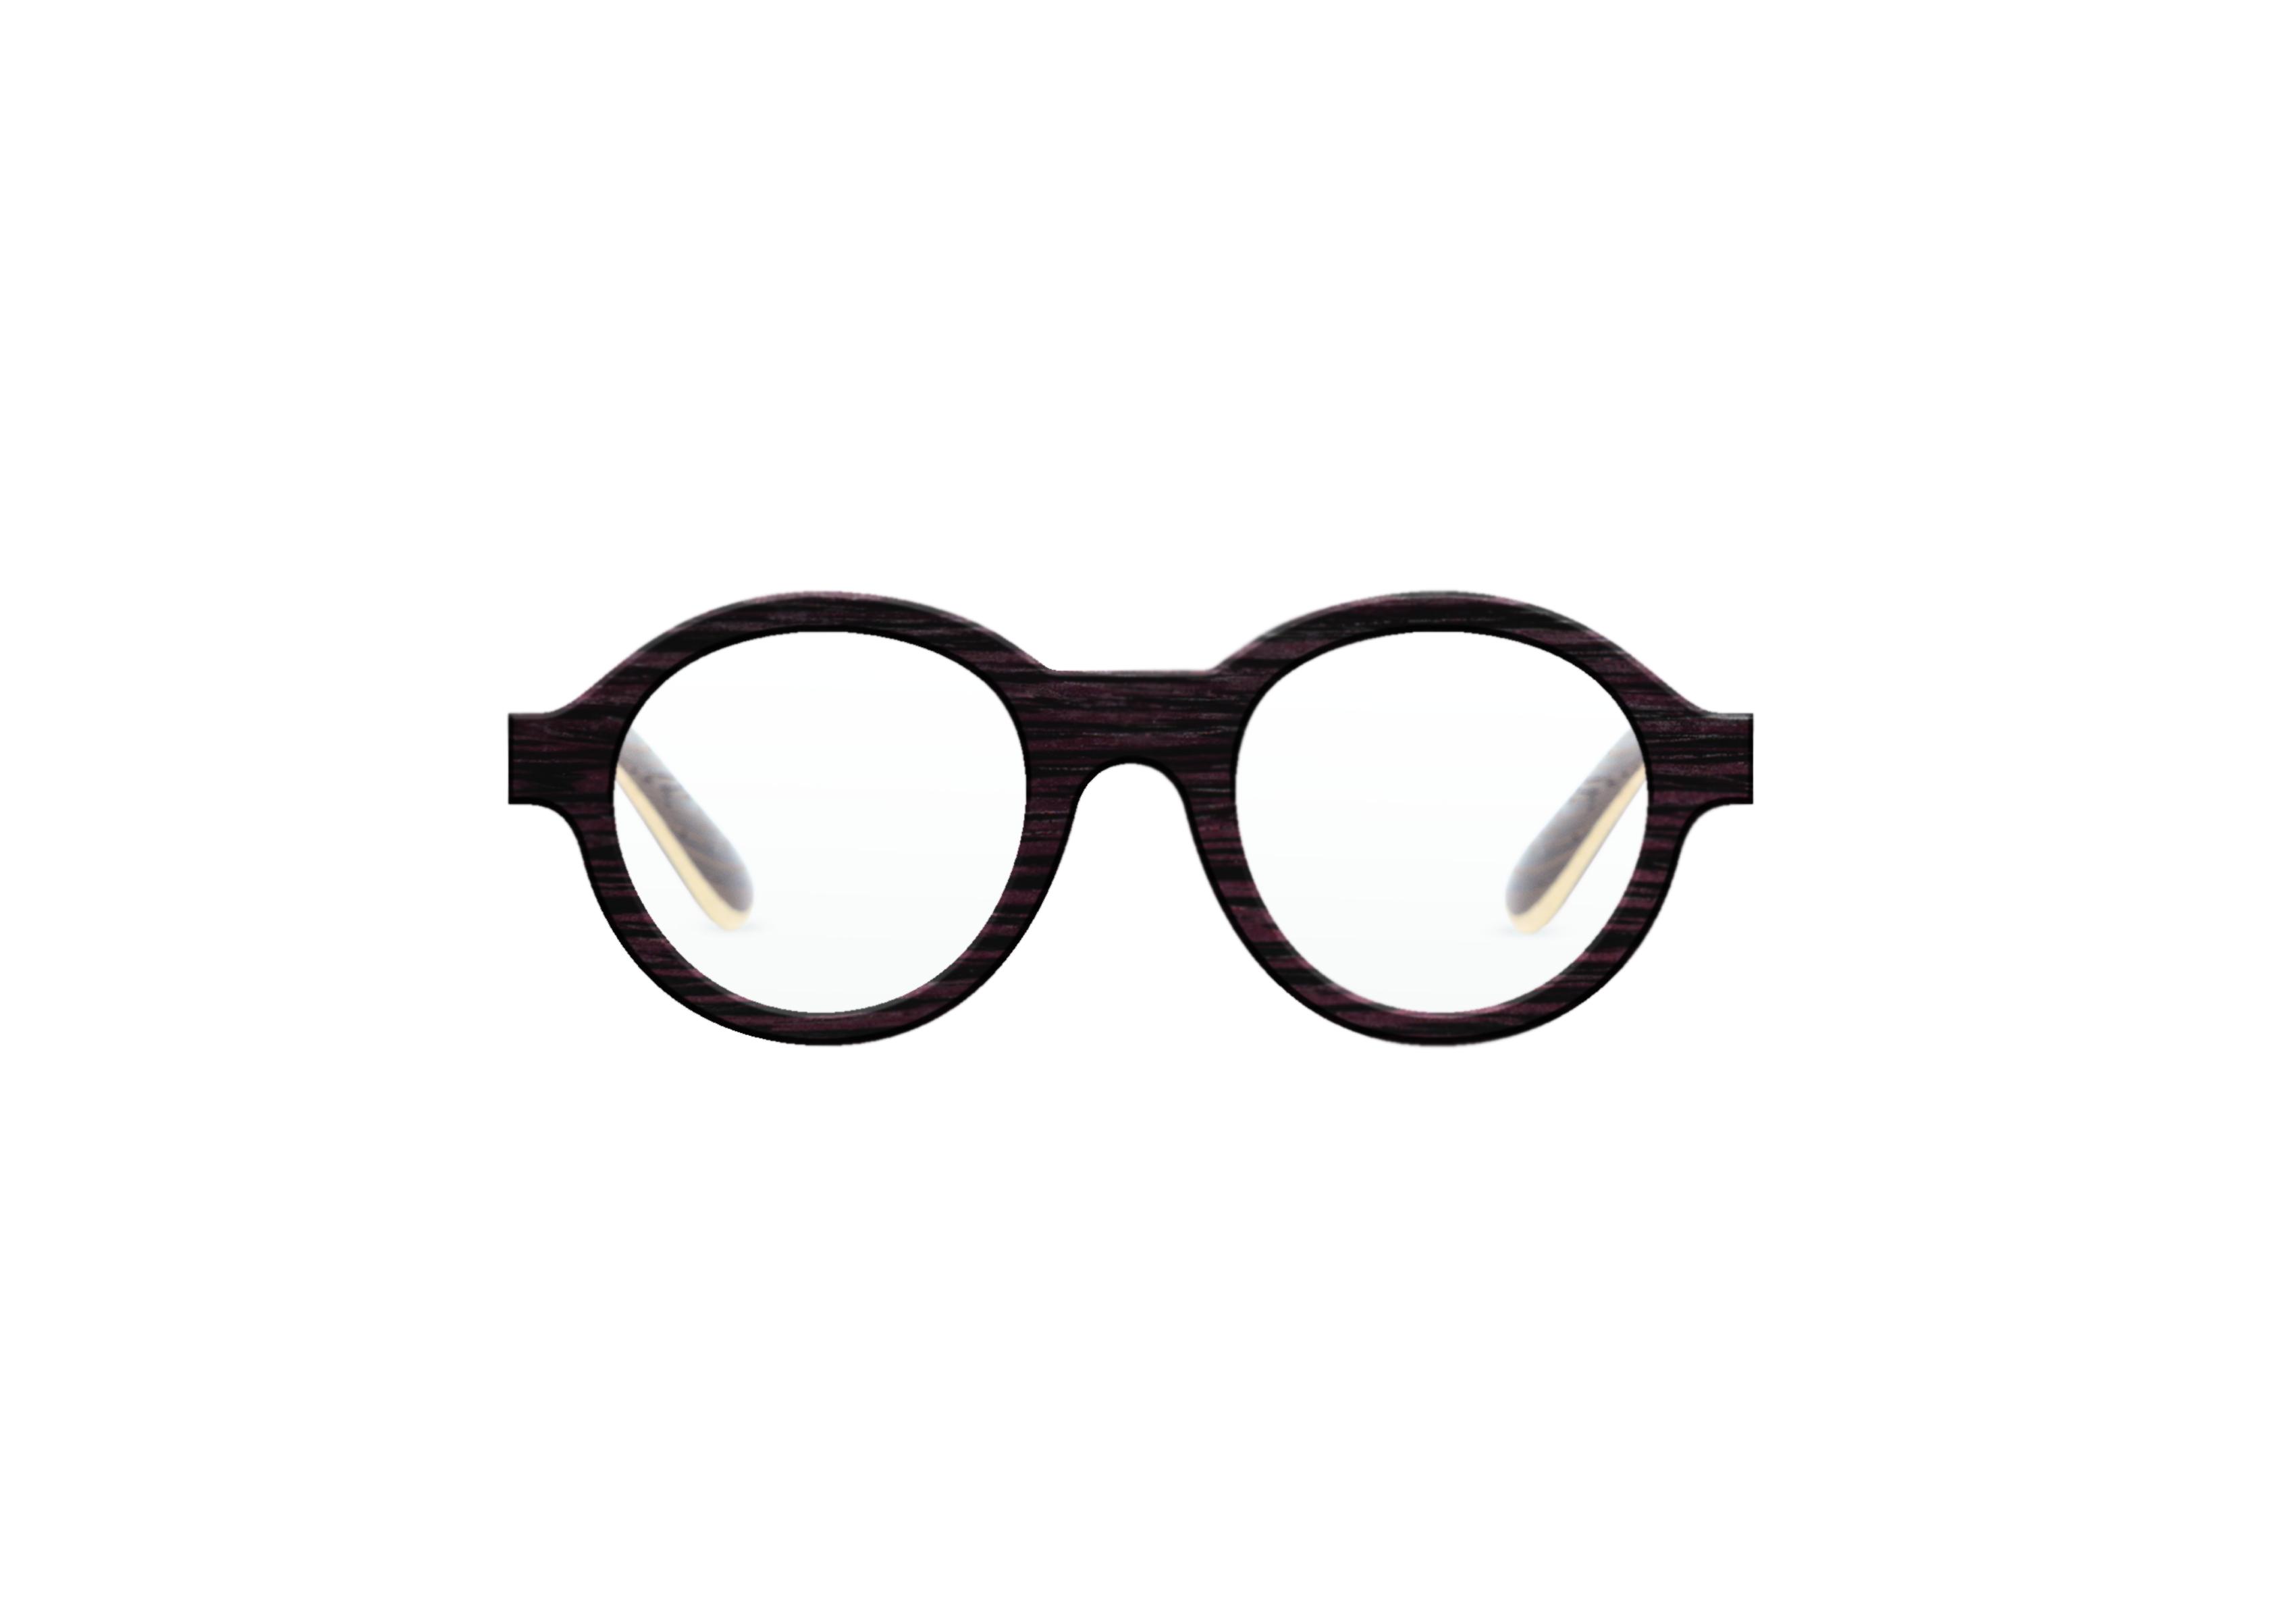 VAKAY handmade wooden eyewear